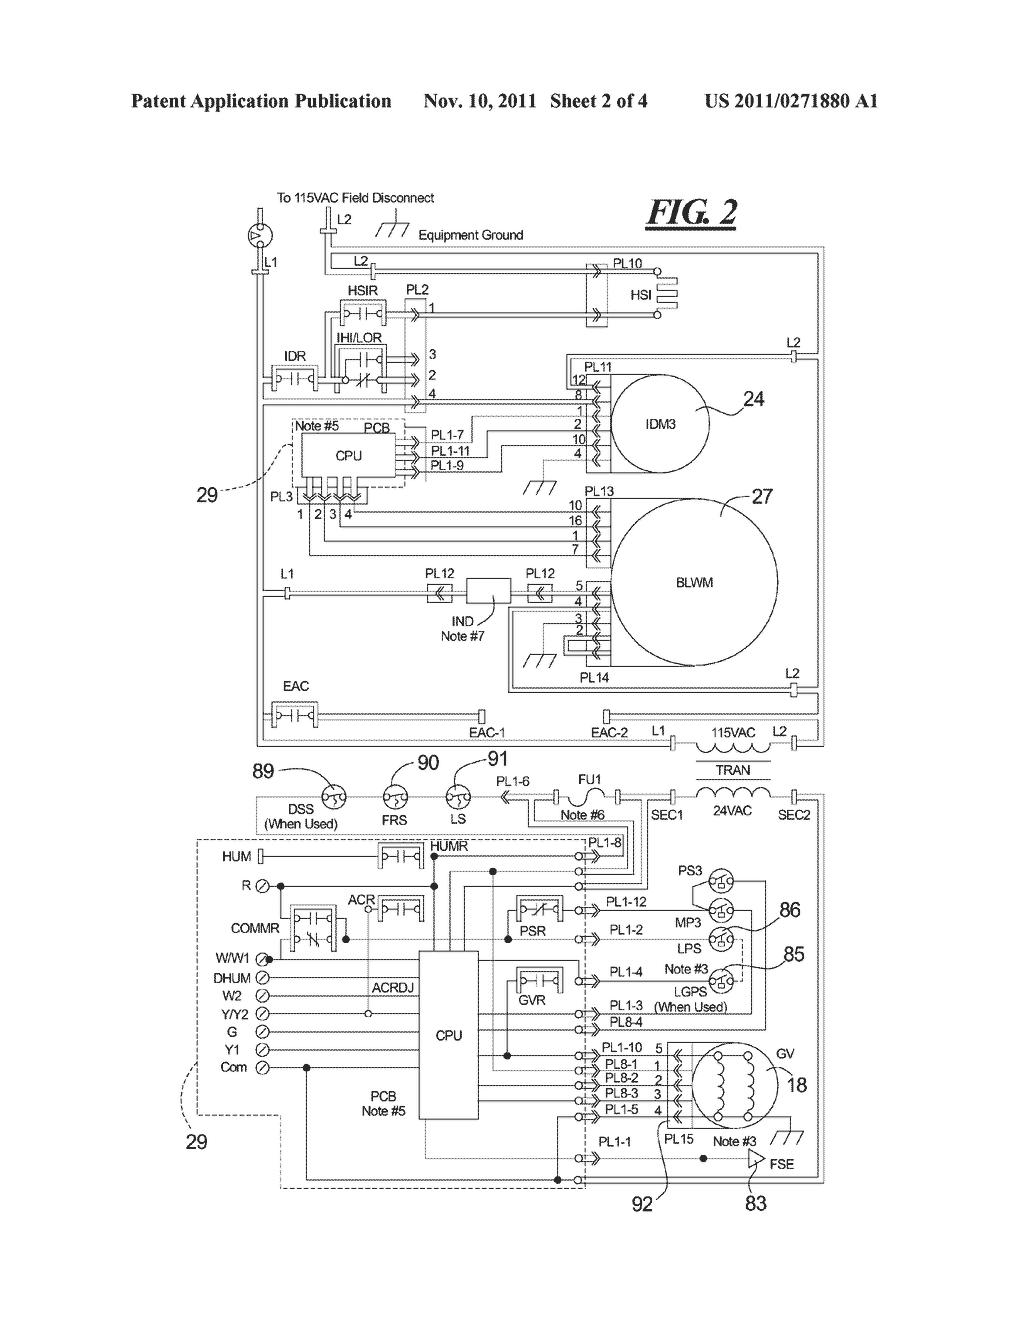 24 volt furnace transformer wiring diagram